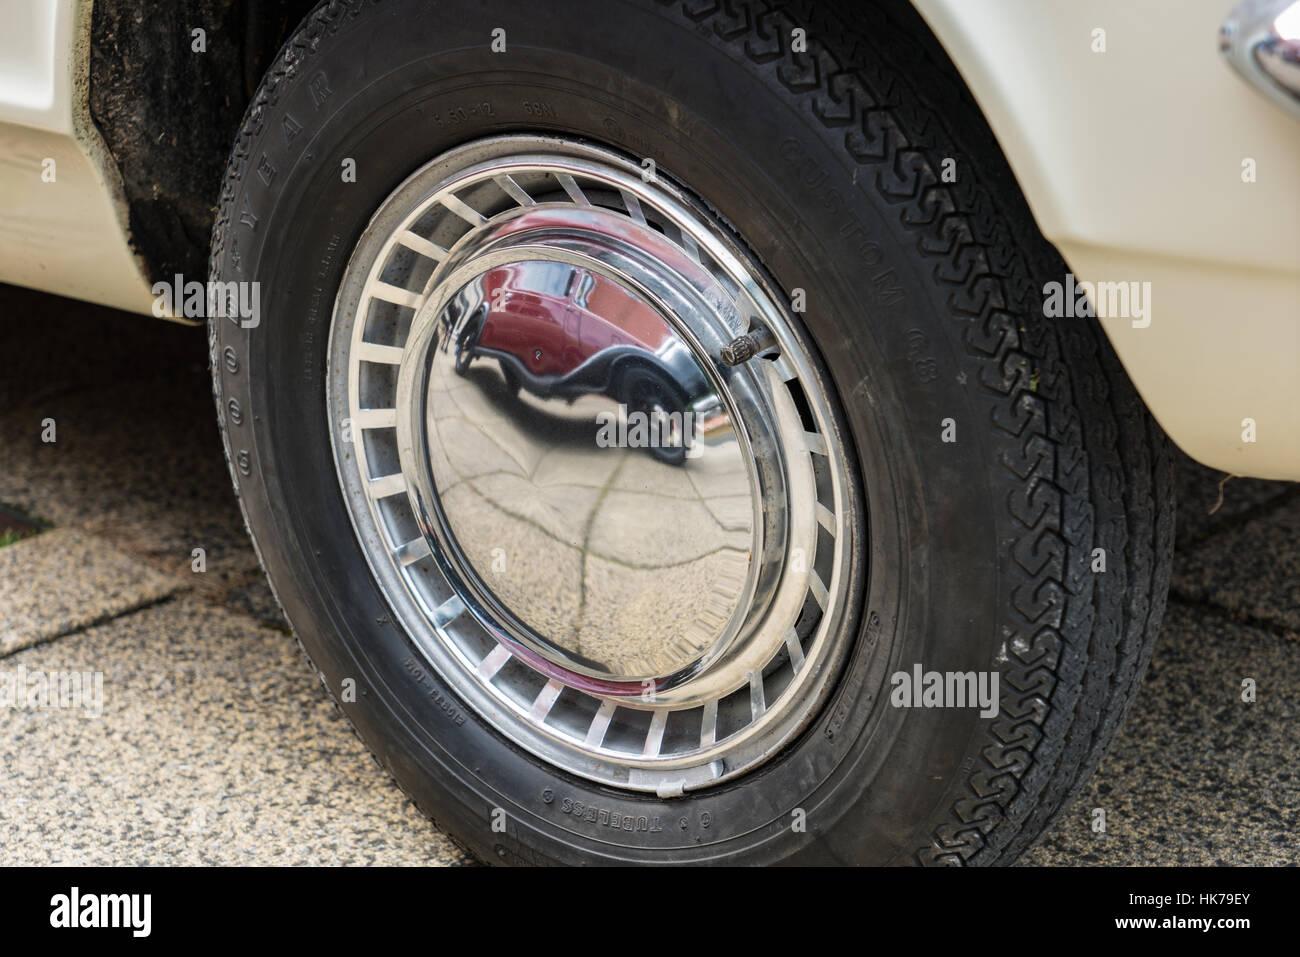 Hub Cap Stock Photos Images Alamy Alfa Romeo Wheel Centre Caps Austin Seven Reflected In The Chrome Of A Vauxhall Viva Image